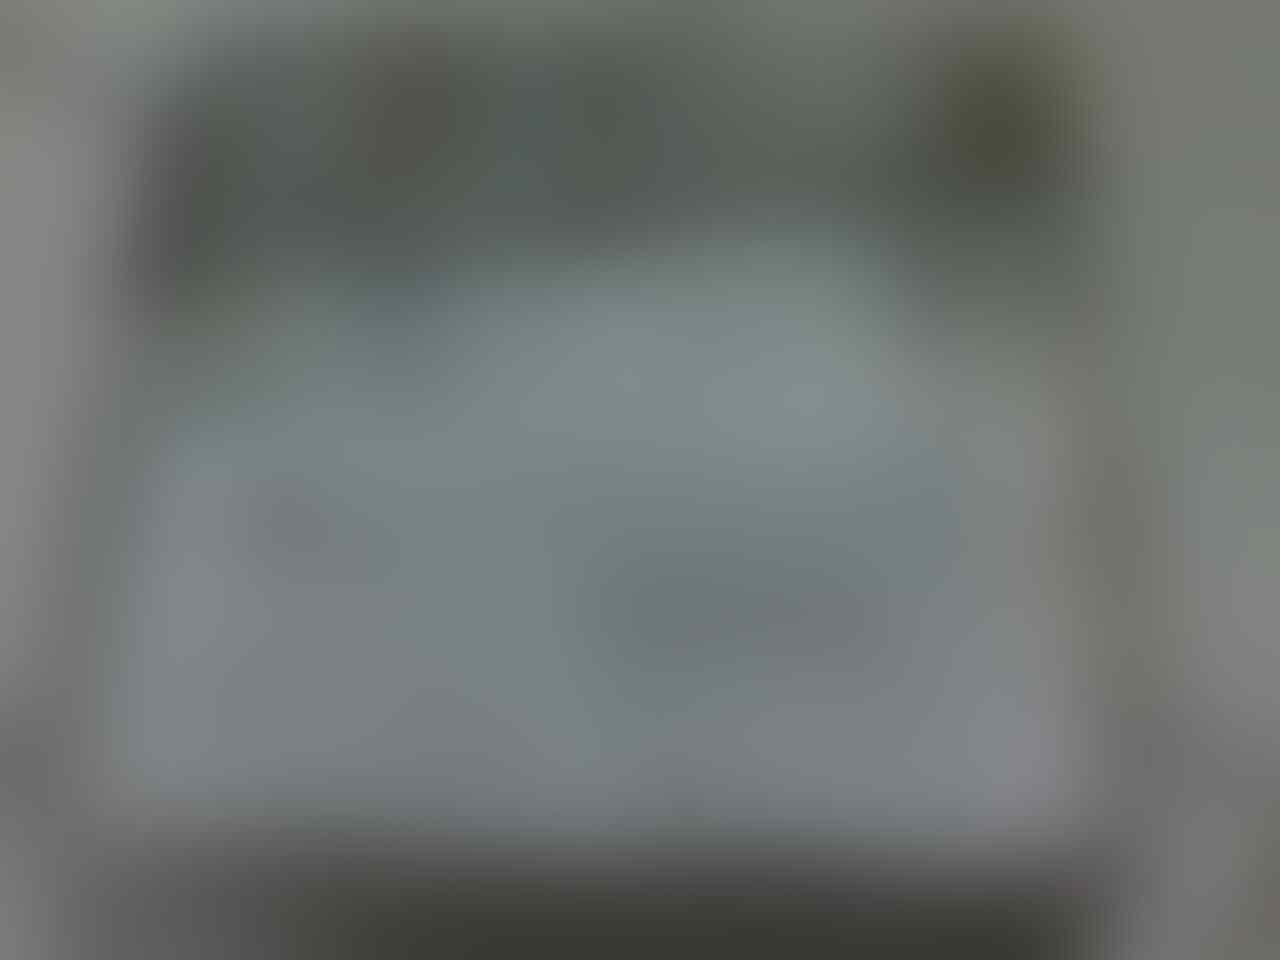 ▓█ NEW BNIB Asus Fonepad 7 K012 FE170CG Garansi Resmi ▓█